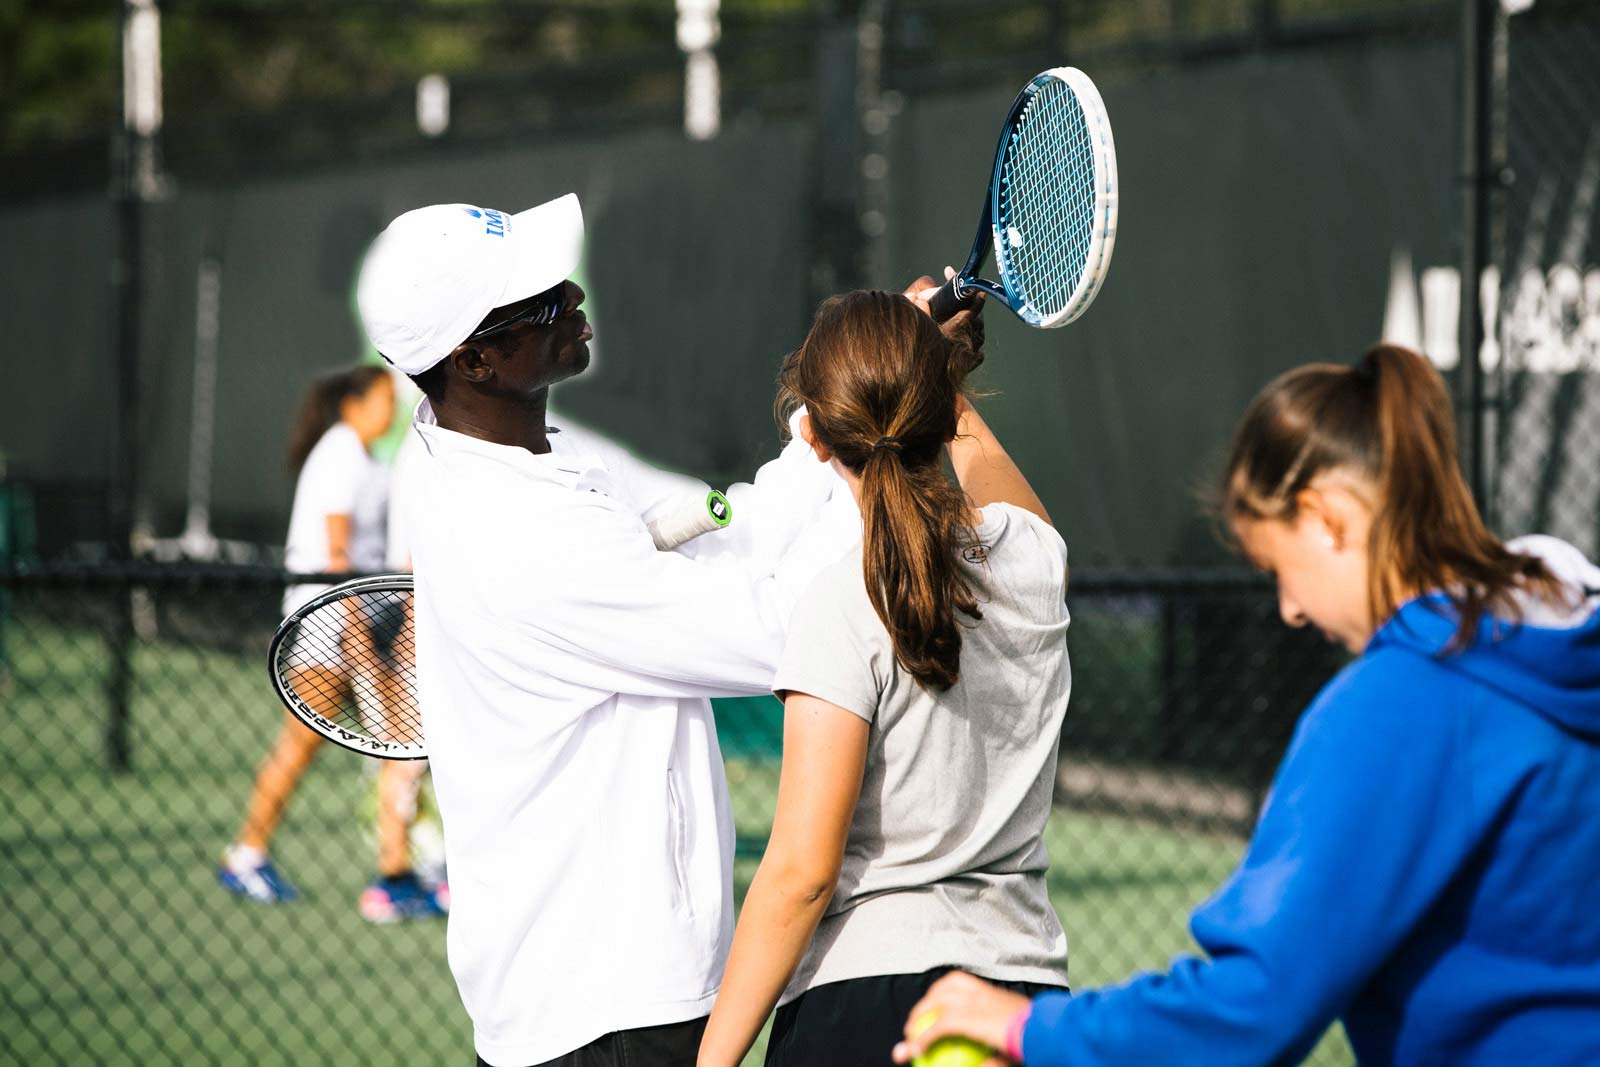 Girls Tennis Camps Girls Tennis Training Img Academy 2019